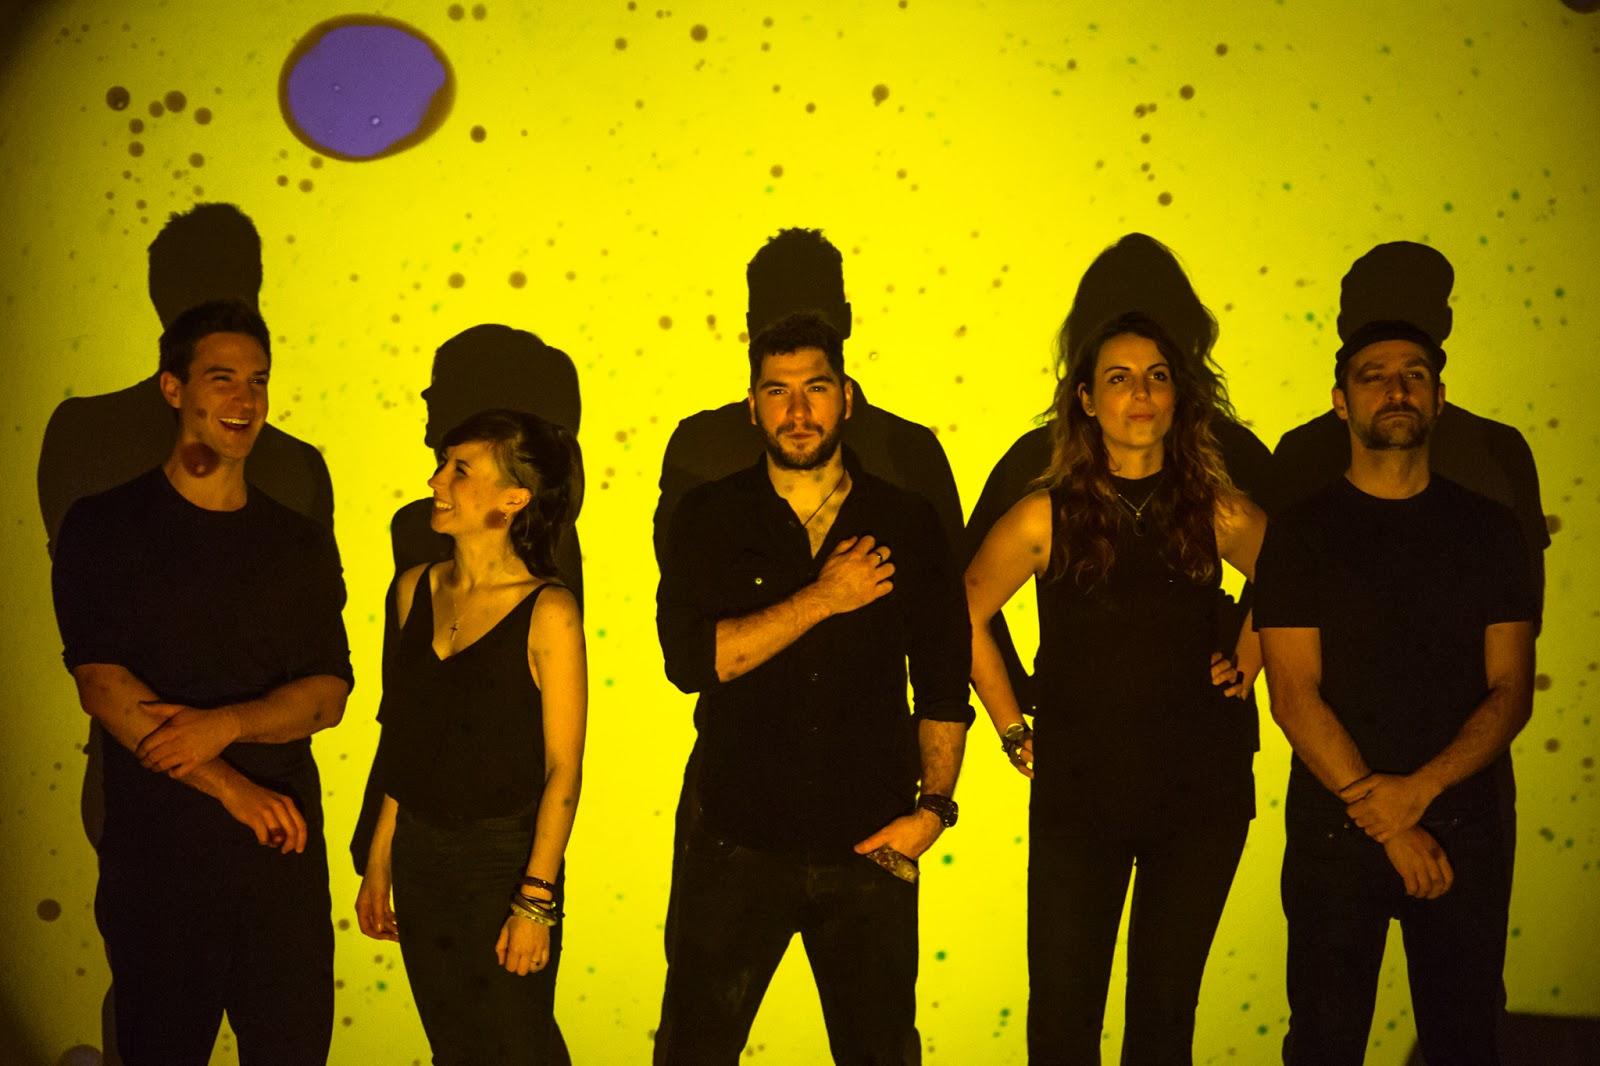 Yusufla Band